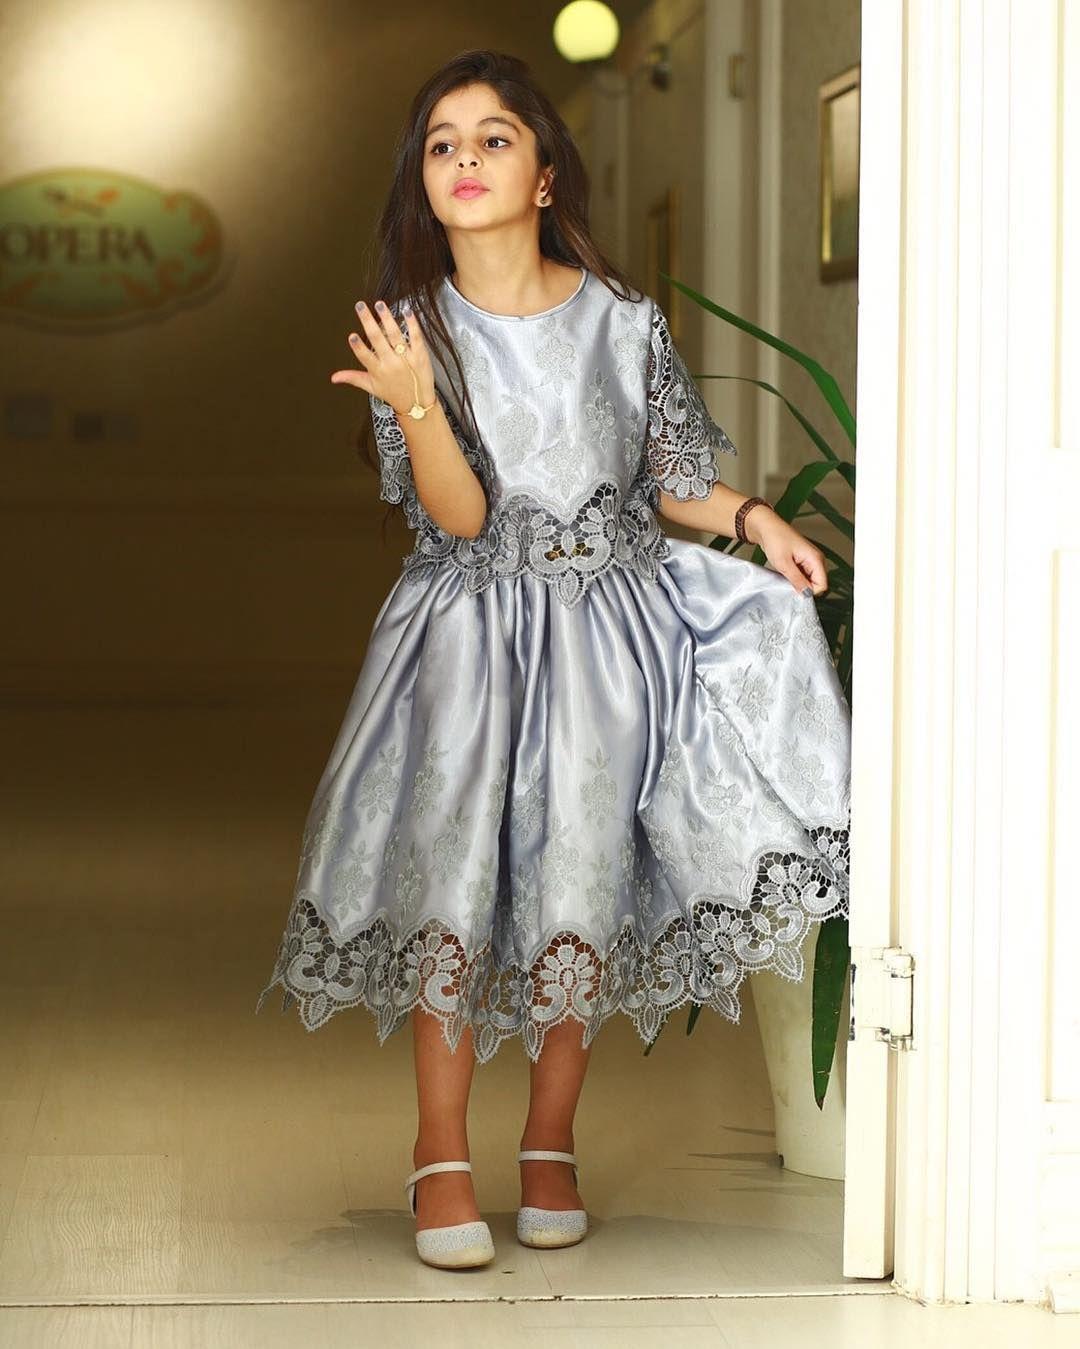 Pin By Amal Abdulla On ورد المحيسن Flower Girl Dresses Dresses Wedding Dresses